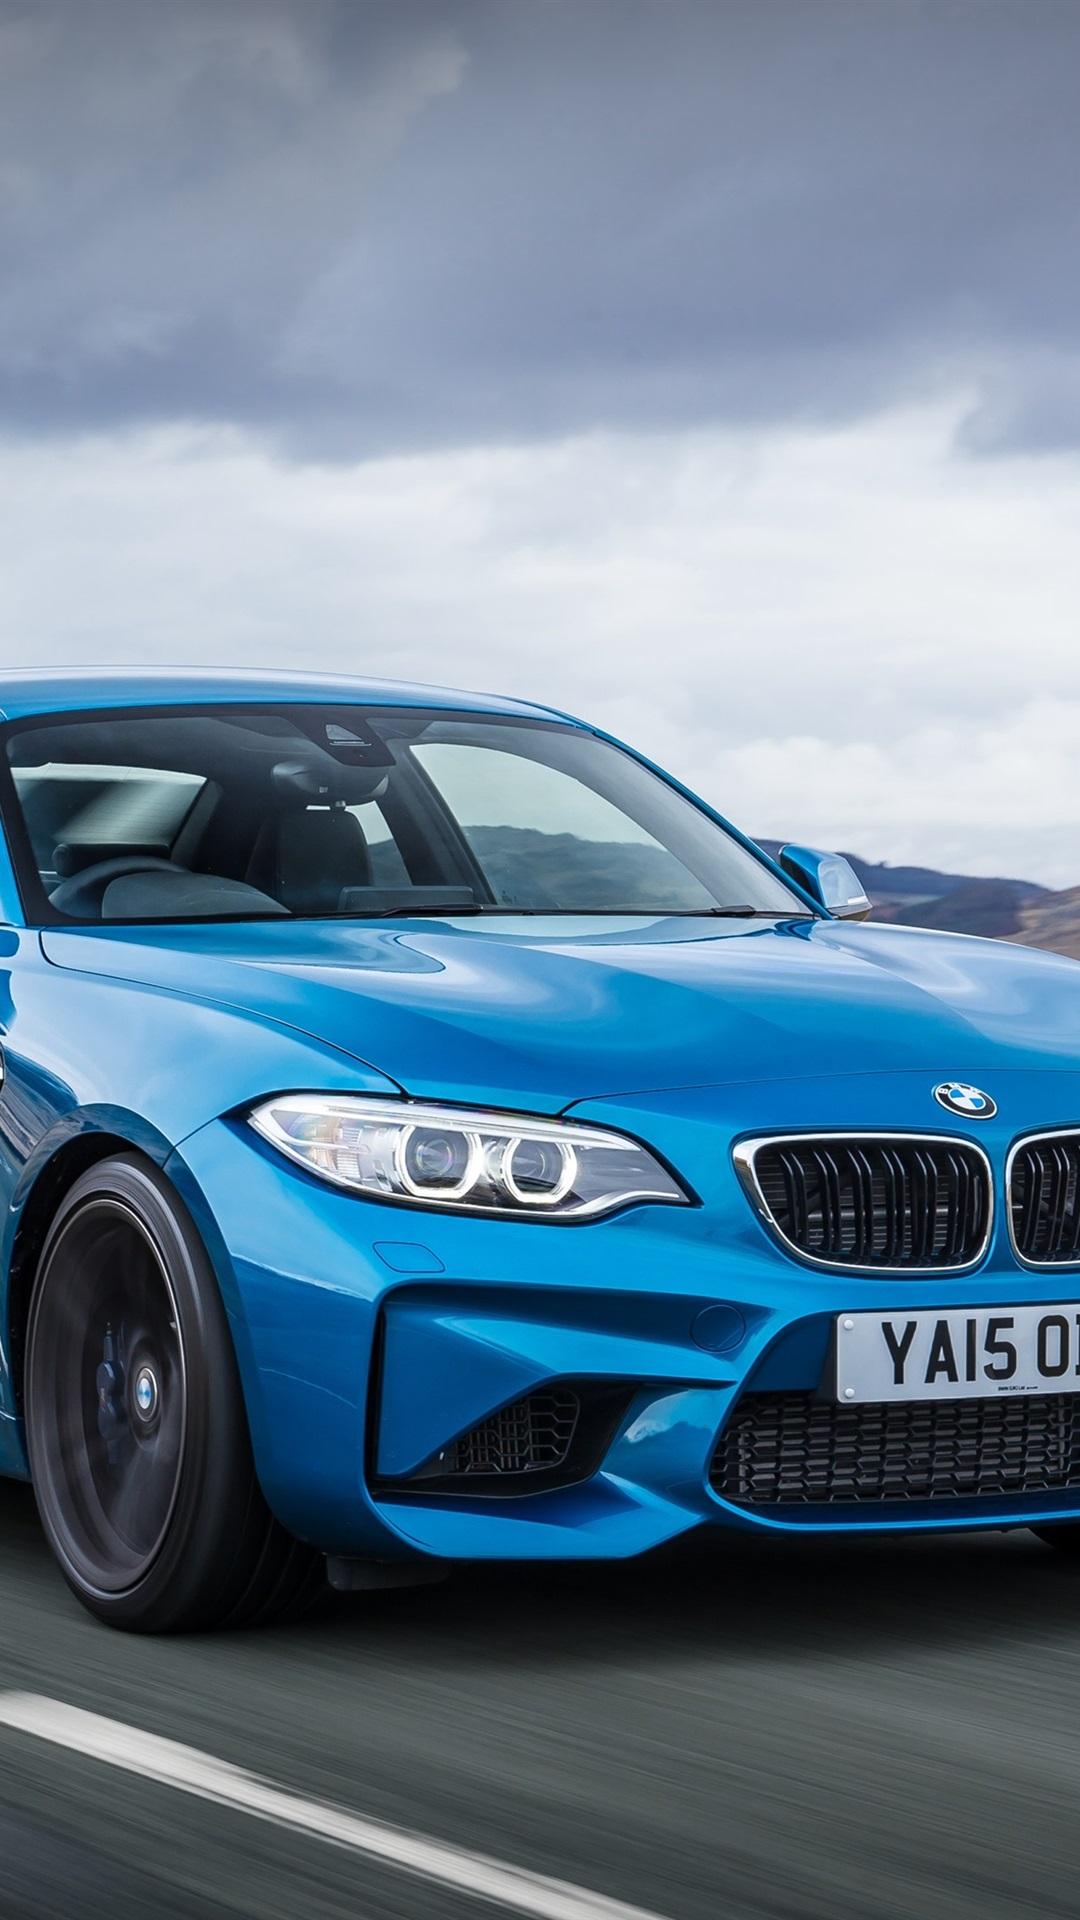 Bmw M2 Coupe F87 Blau Fahrzeuggeschwindigkeit 3840x2160 Uhd